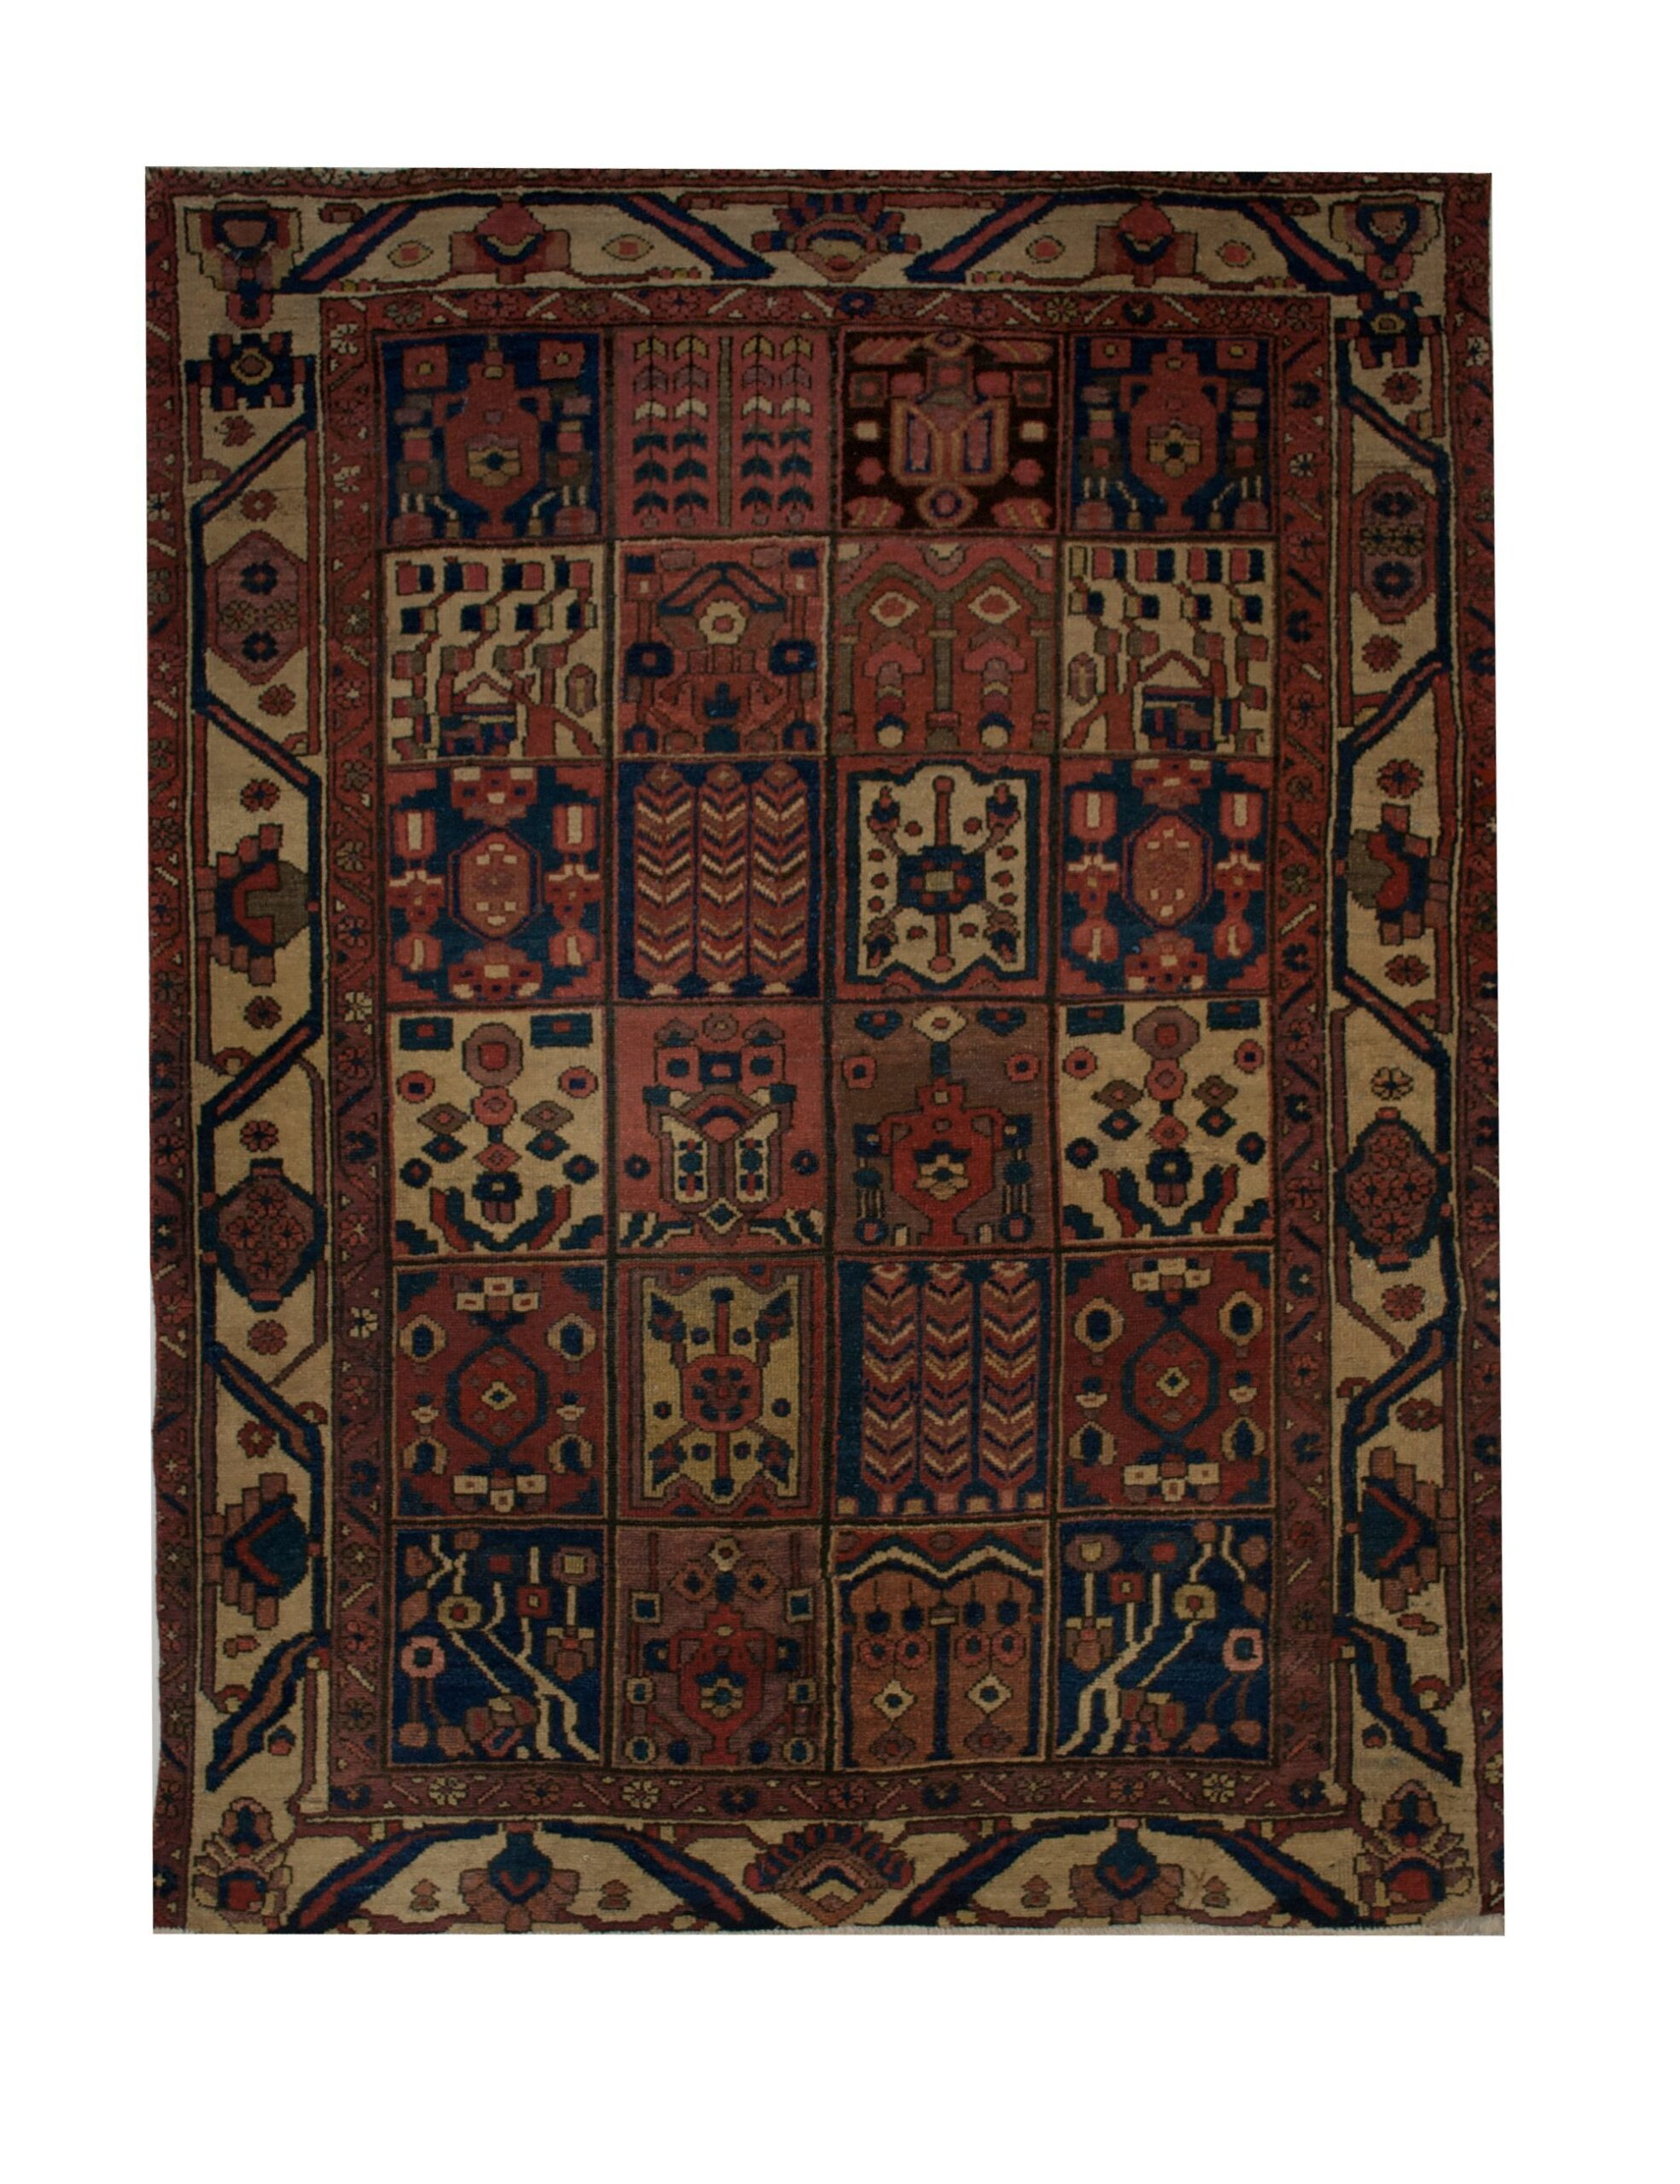 "Antique Persian Bakhtiari 5' x 6' 6"" Handmade Wool Area Rug - Shabahang Royal Carpet"